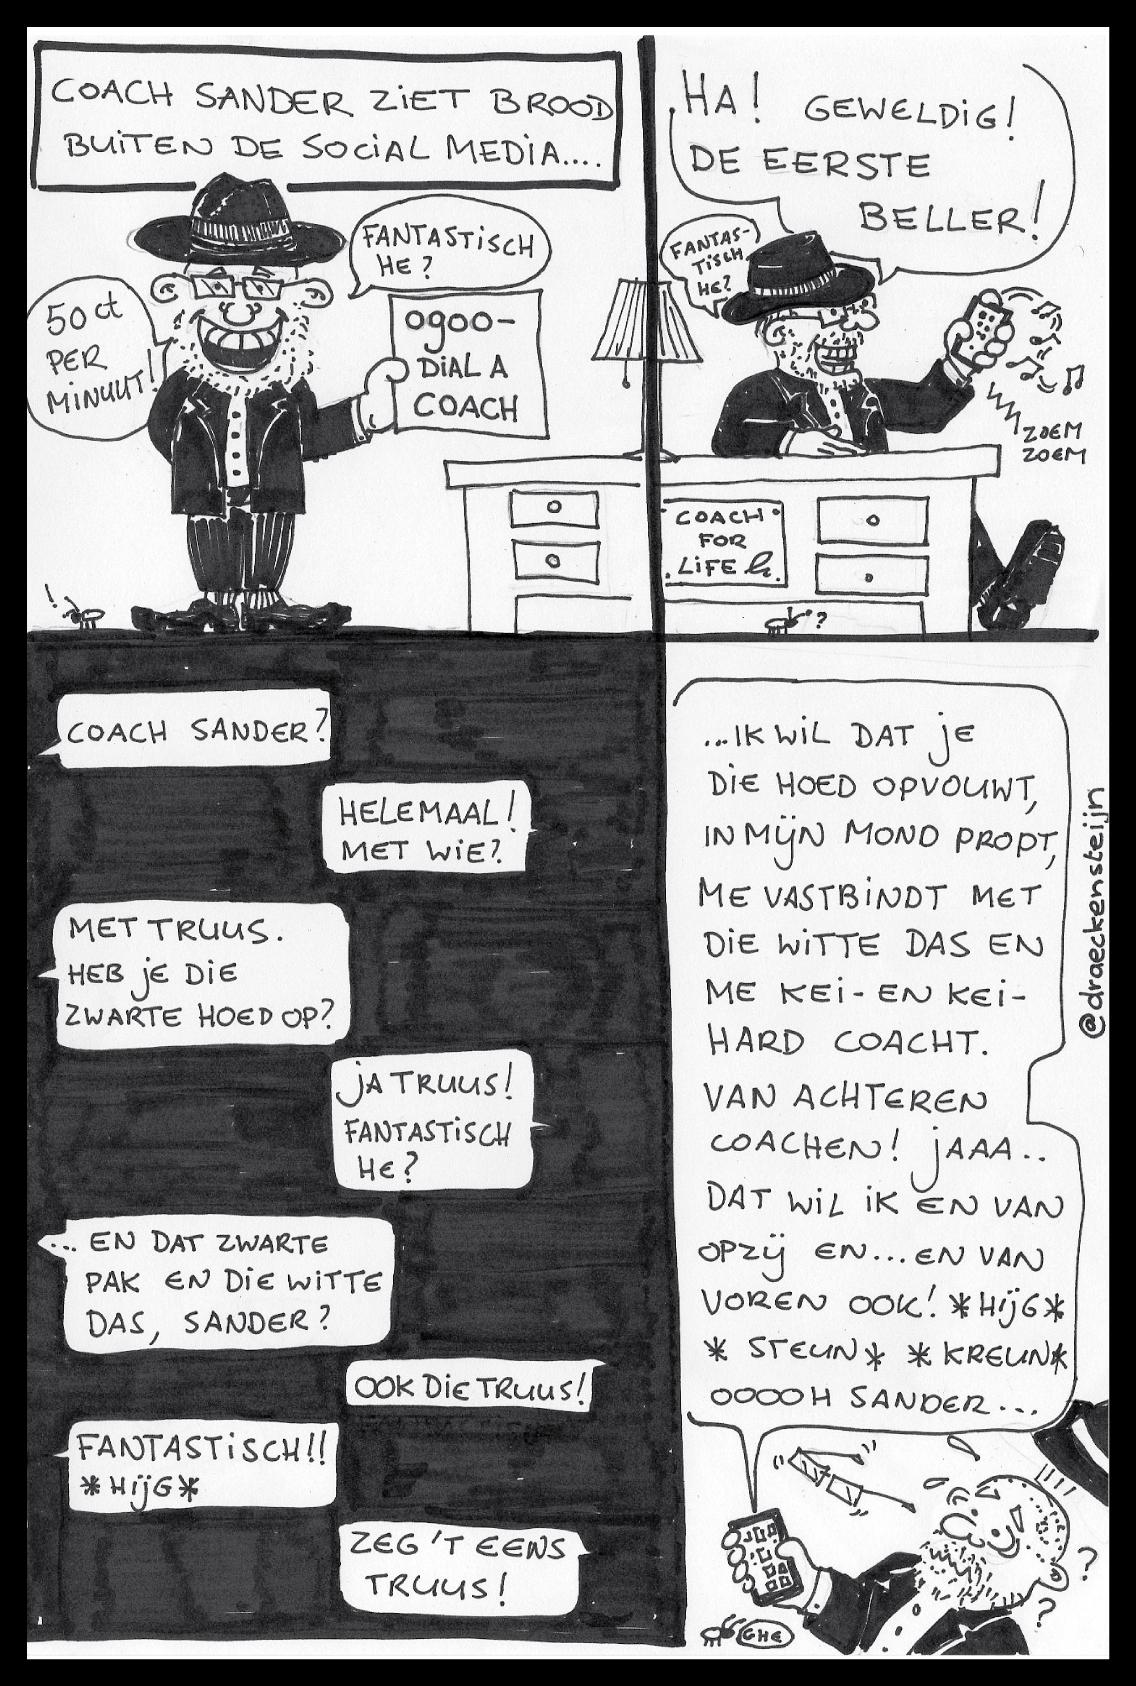 Cartoon CoachSander